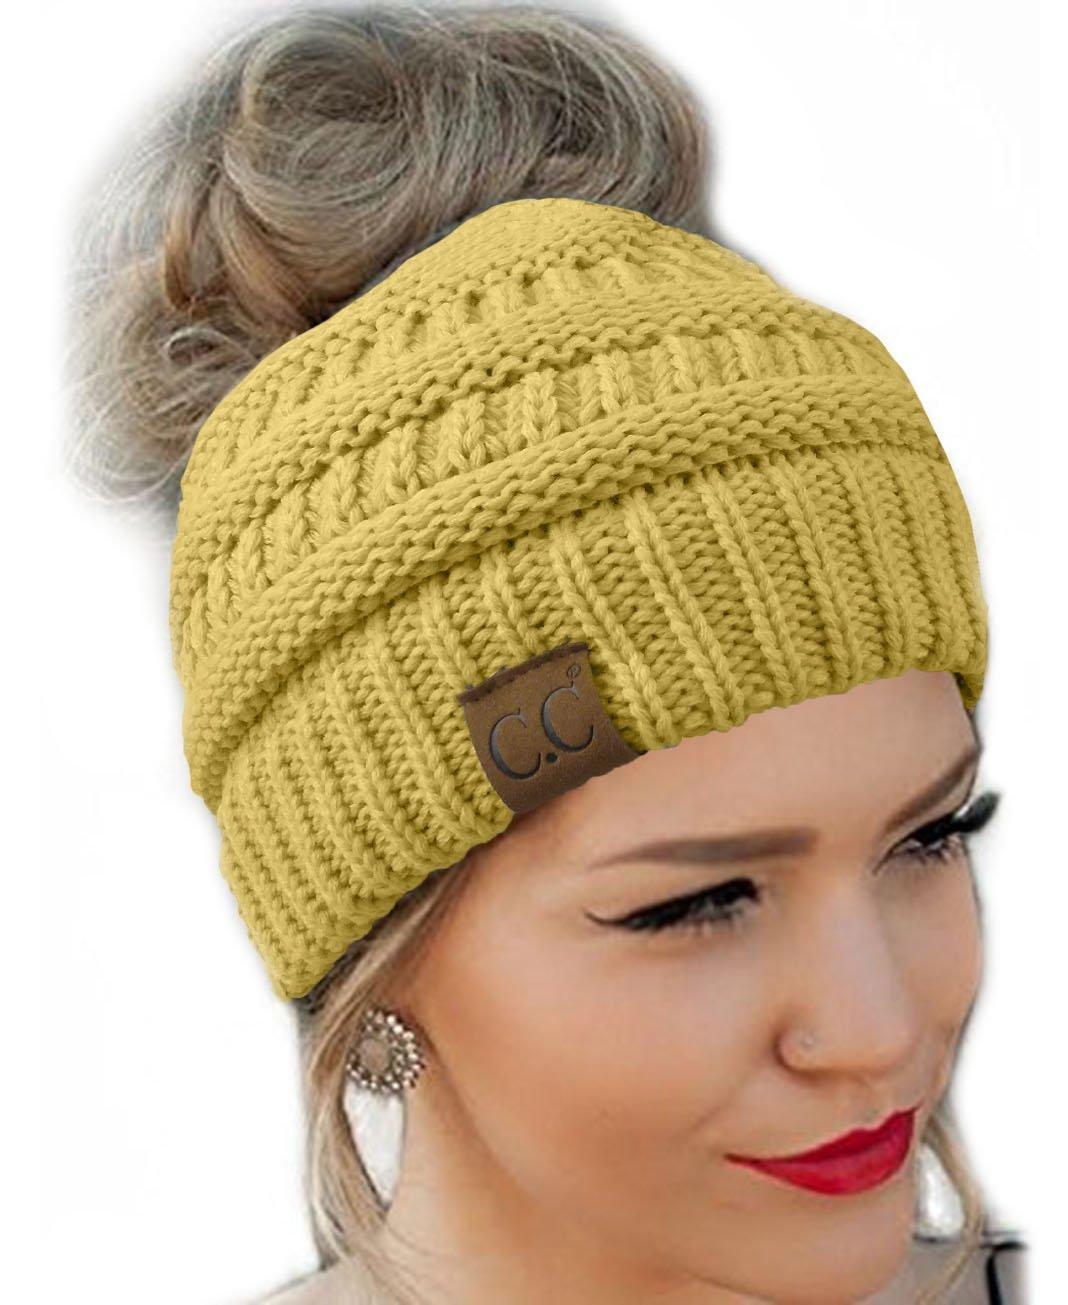 Messy Bun Hat Beanie CC Quality Knit (Camel)